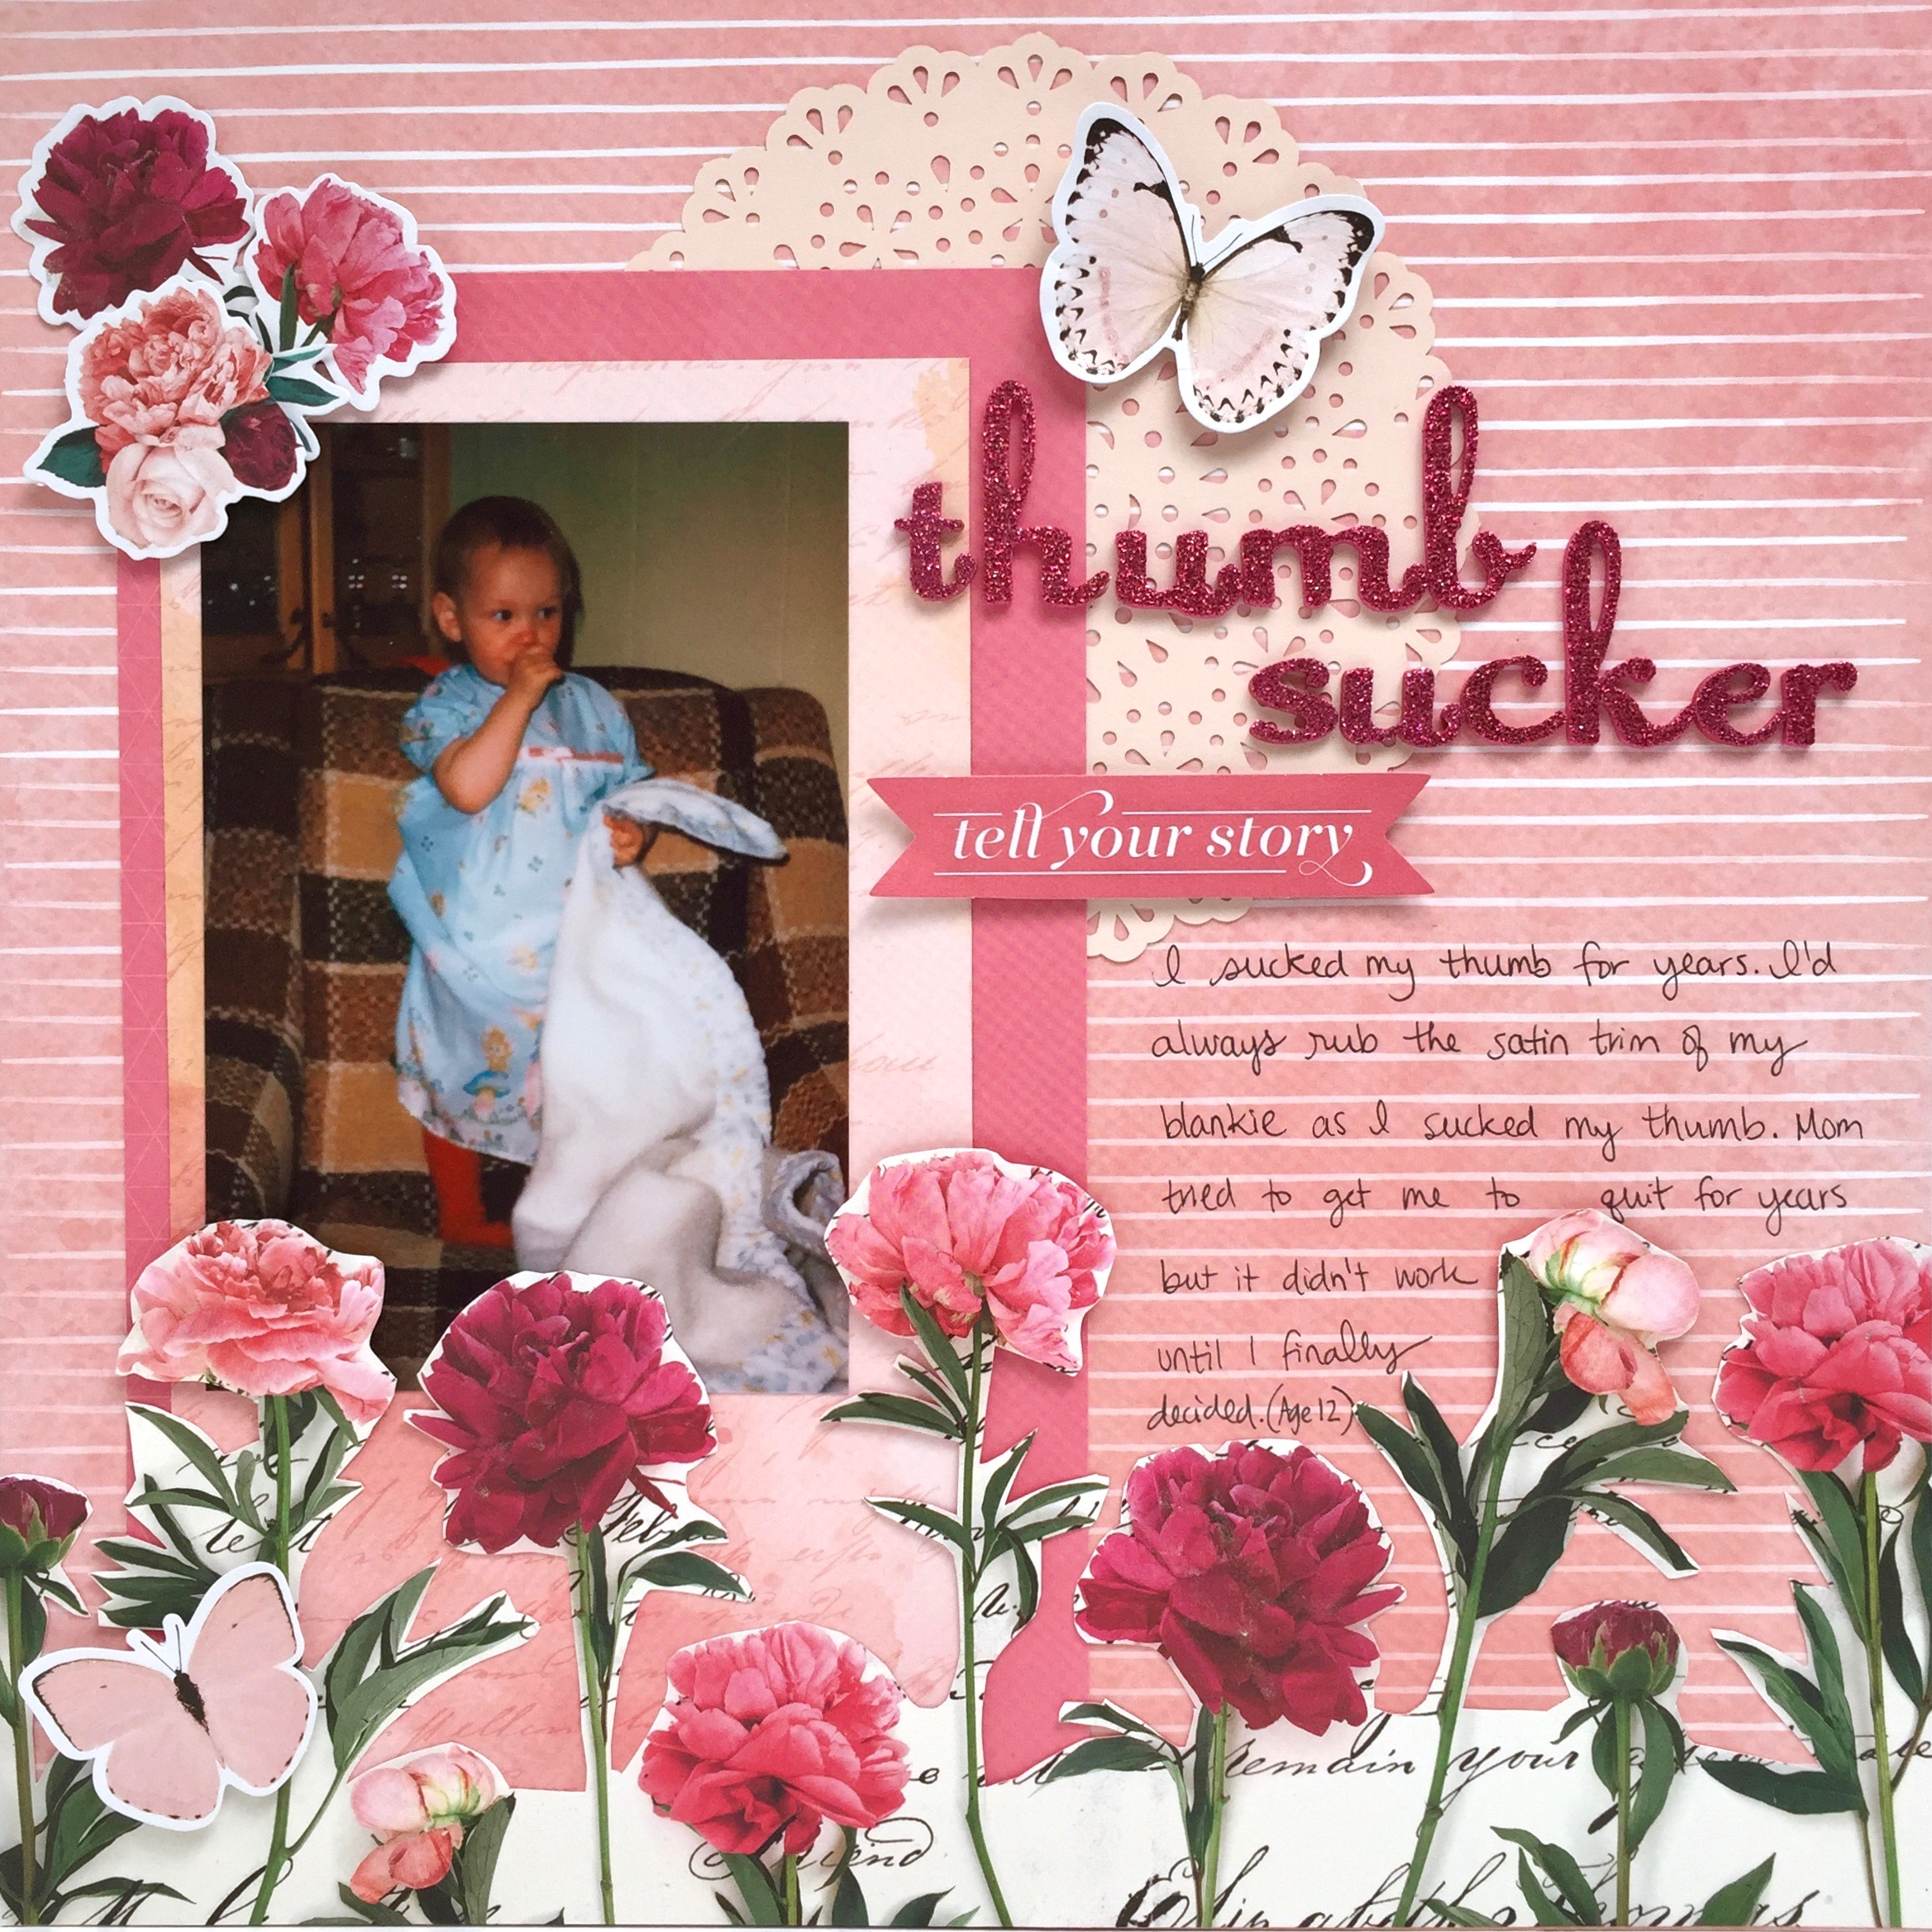 Thumb sucker scrapbook layout by Alice Boll #thumbsucker #blankie #scrapbook #layout #12x12 #pink #doily